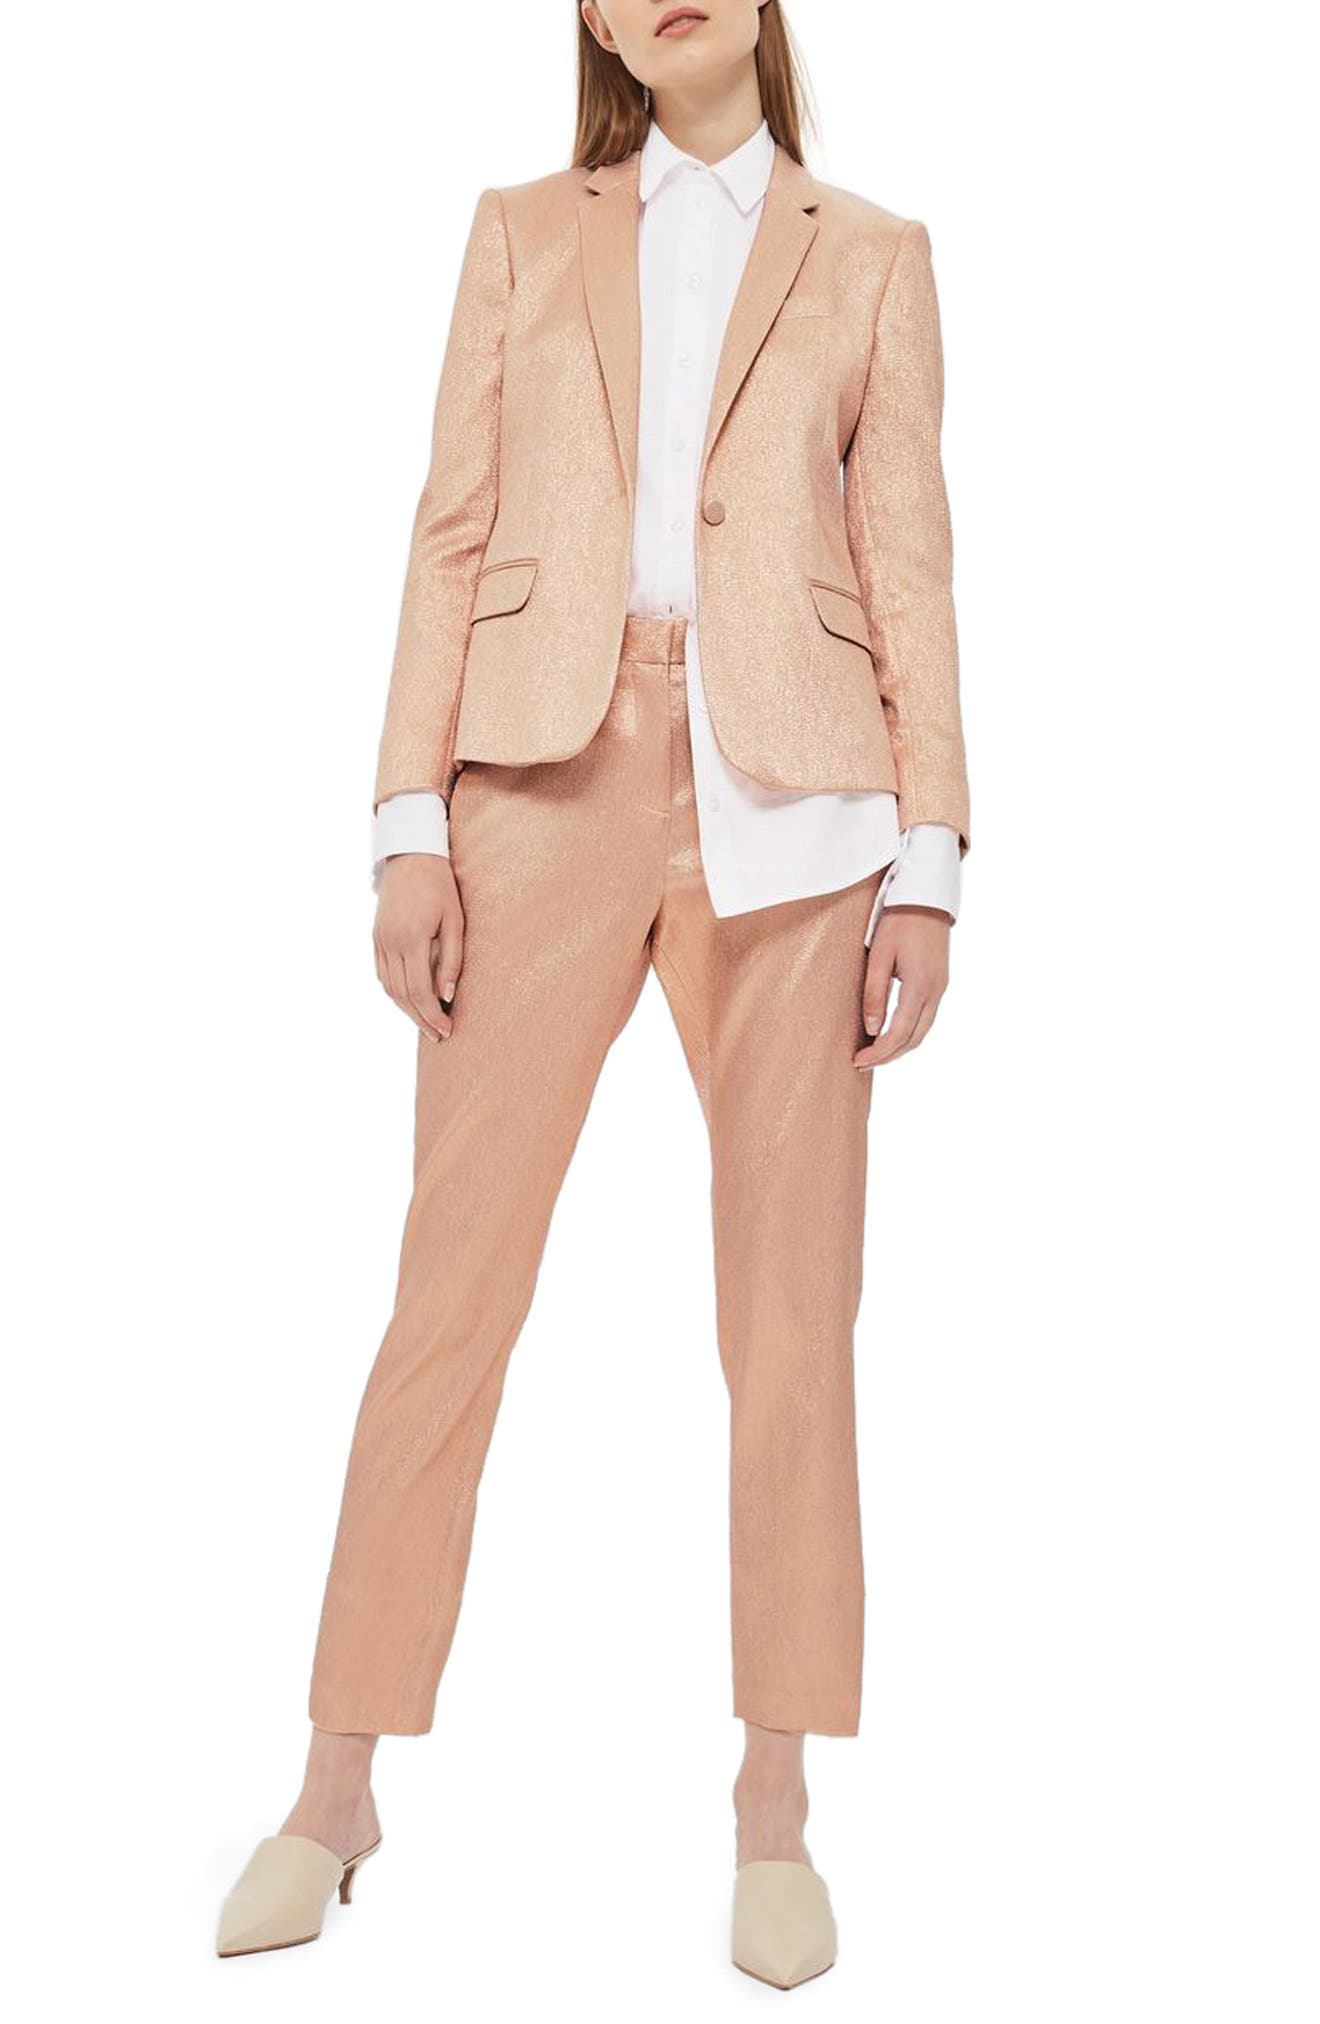 Topshop Metallic Glitter Suit Trousers